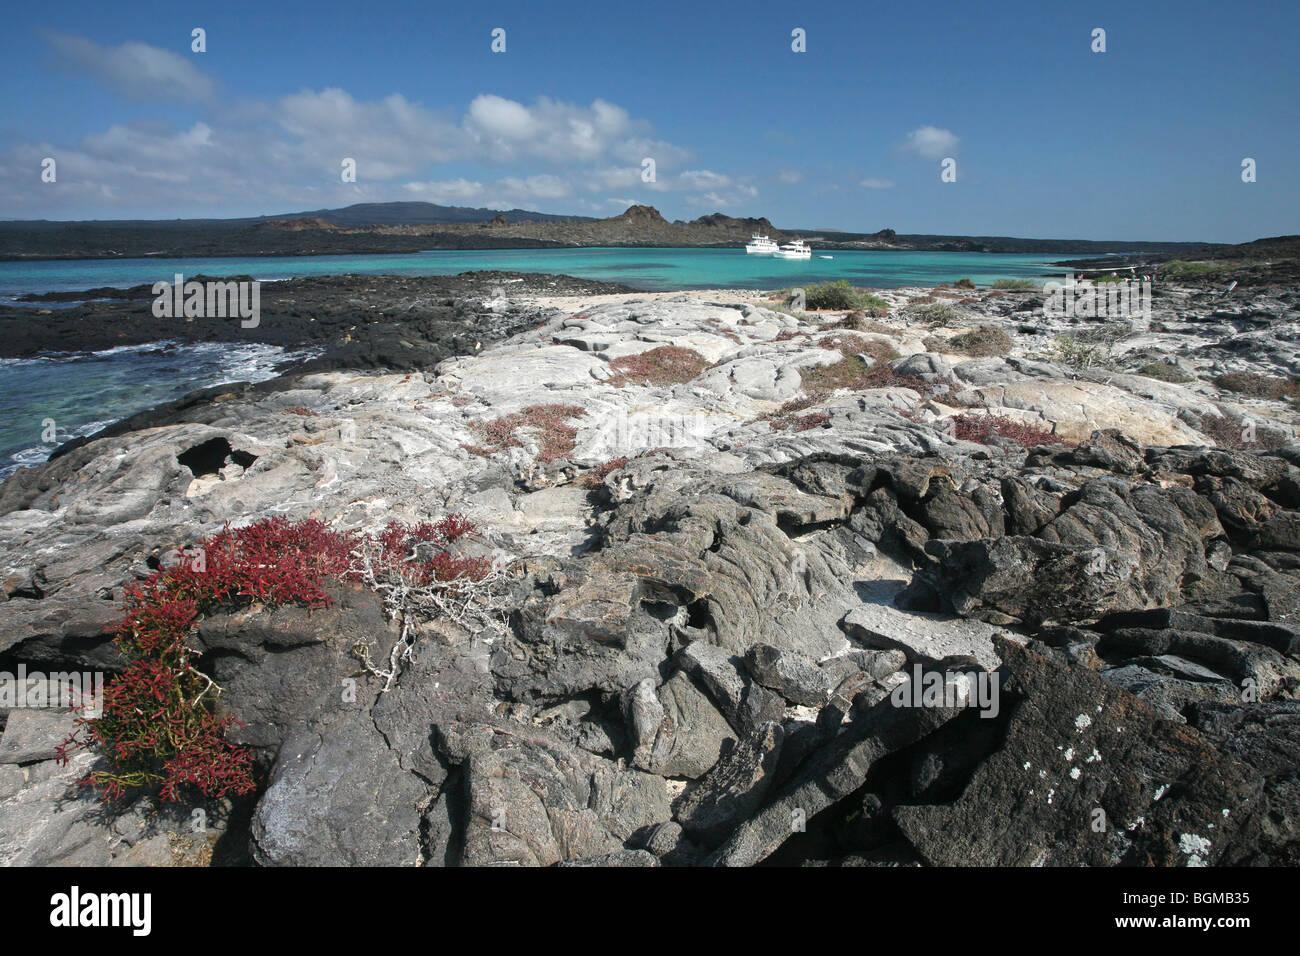 Boats in bay and lava field at Sombrero Chino / Chinaman's Hat on Santiago Island / San Salvador Island, Galápagos - Stock Image